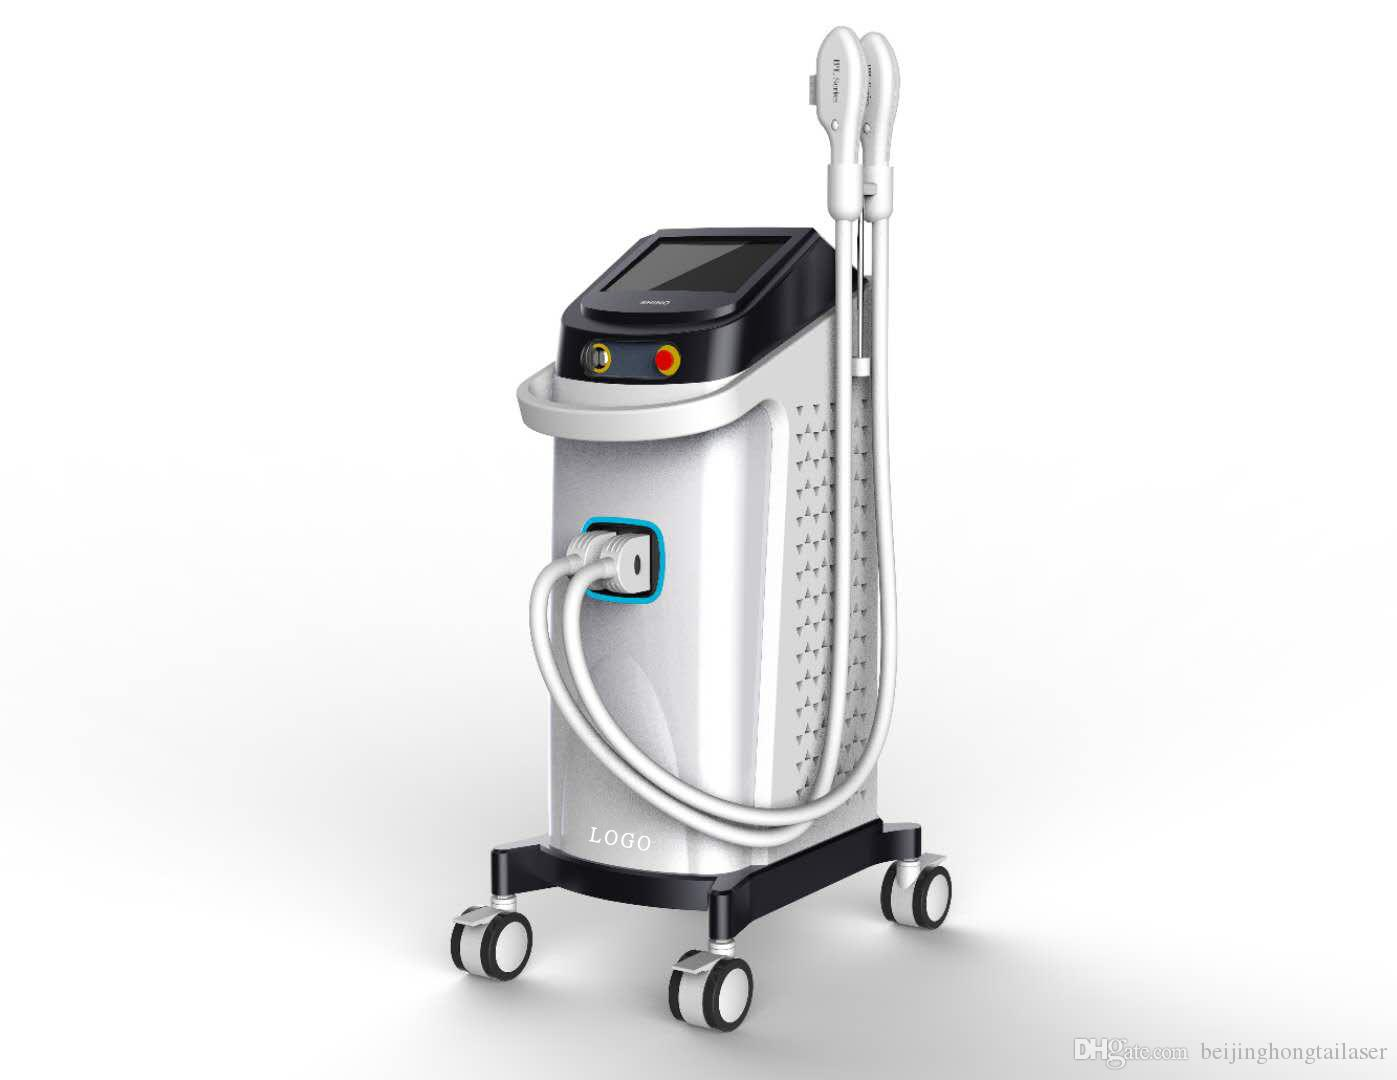 ipl hair removal permanently hair removal rf skin tightening machine salon equipment